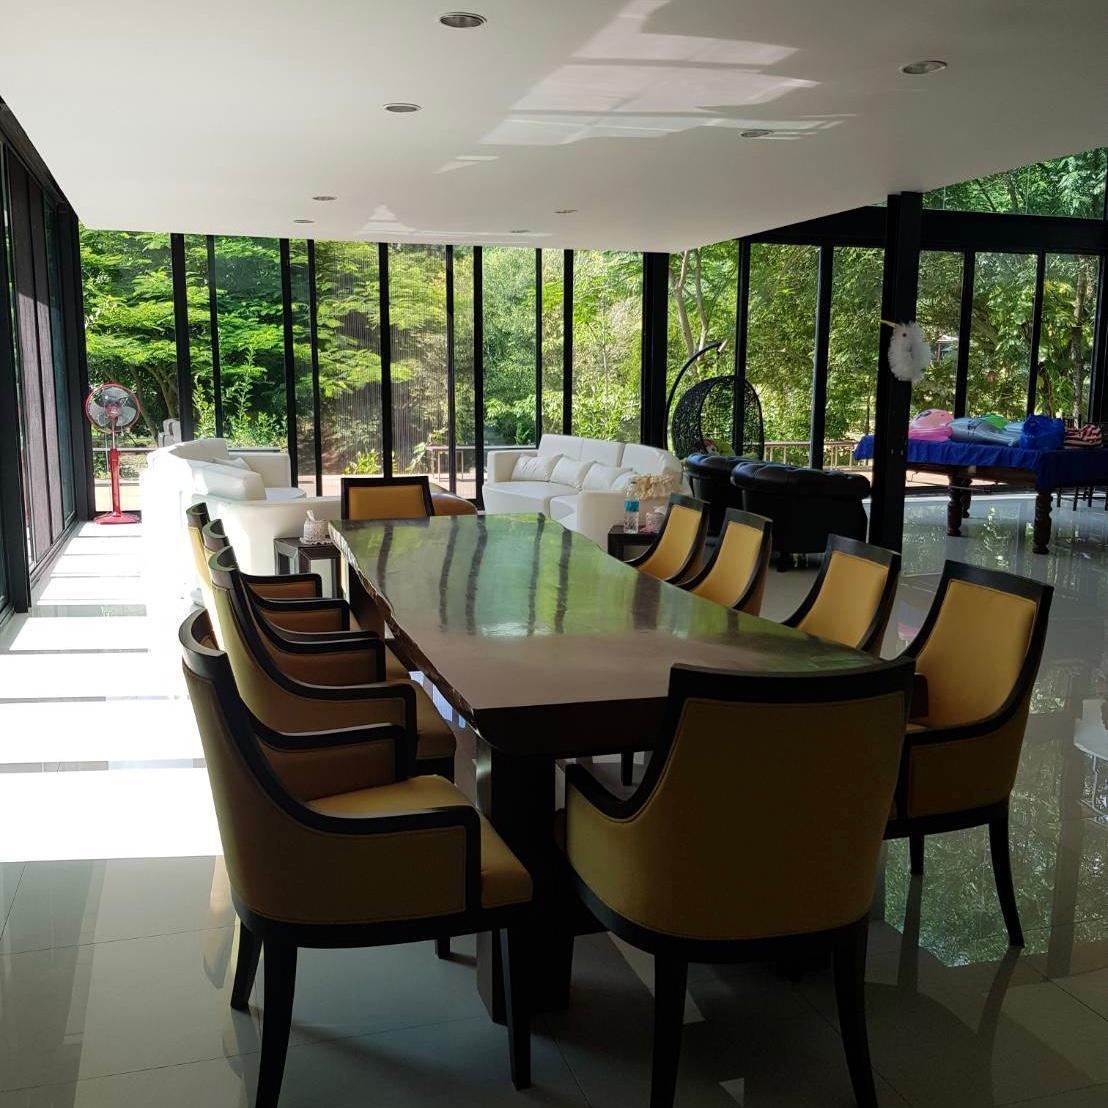 BKD Residence@Khaoyai บีเคดี เรสซิเดนซ์ แอ็ทเขาใหญ่